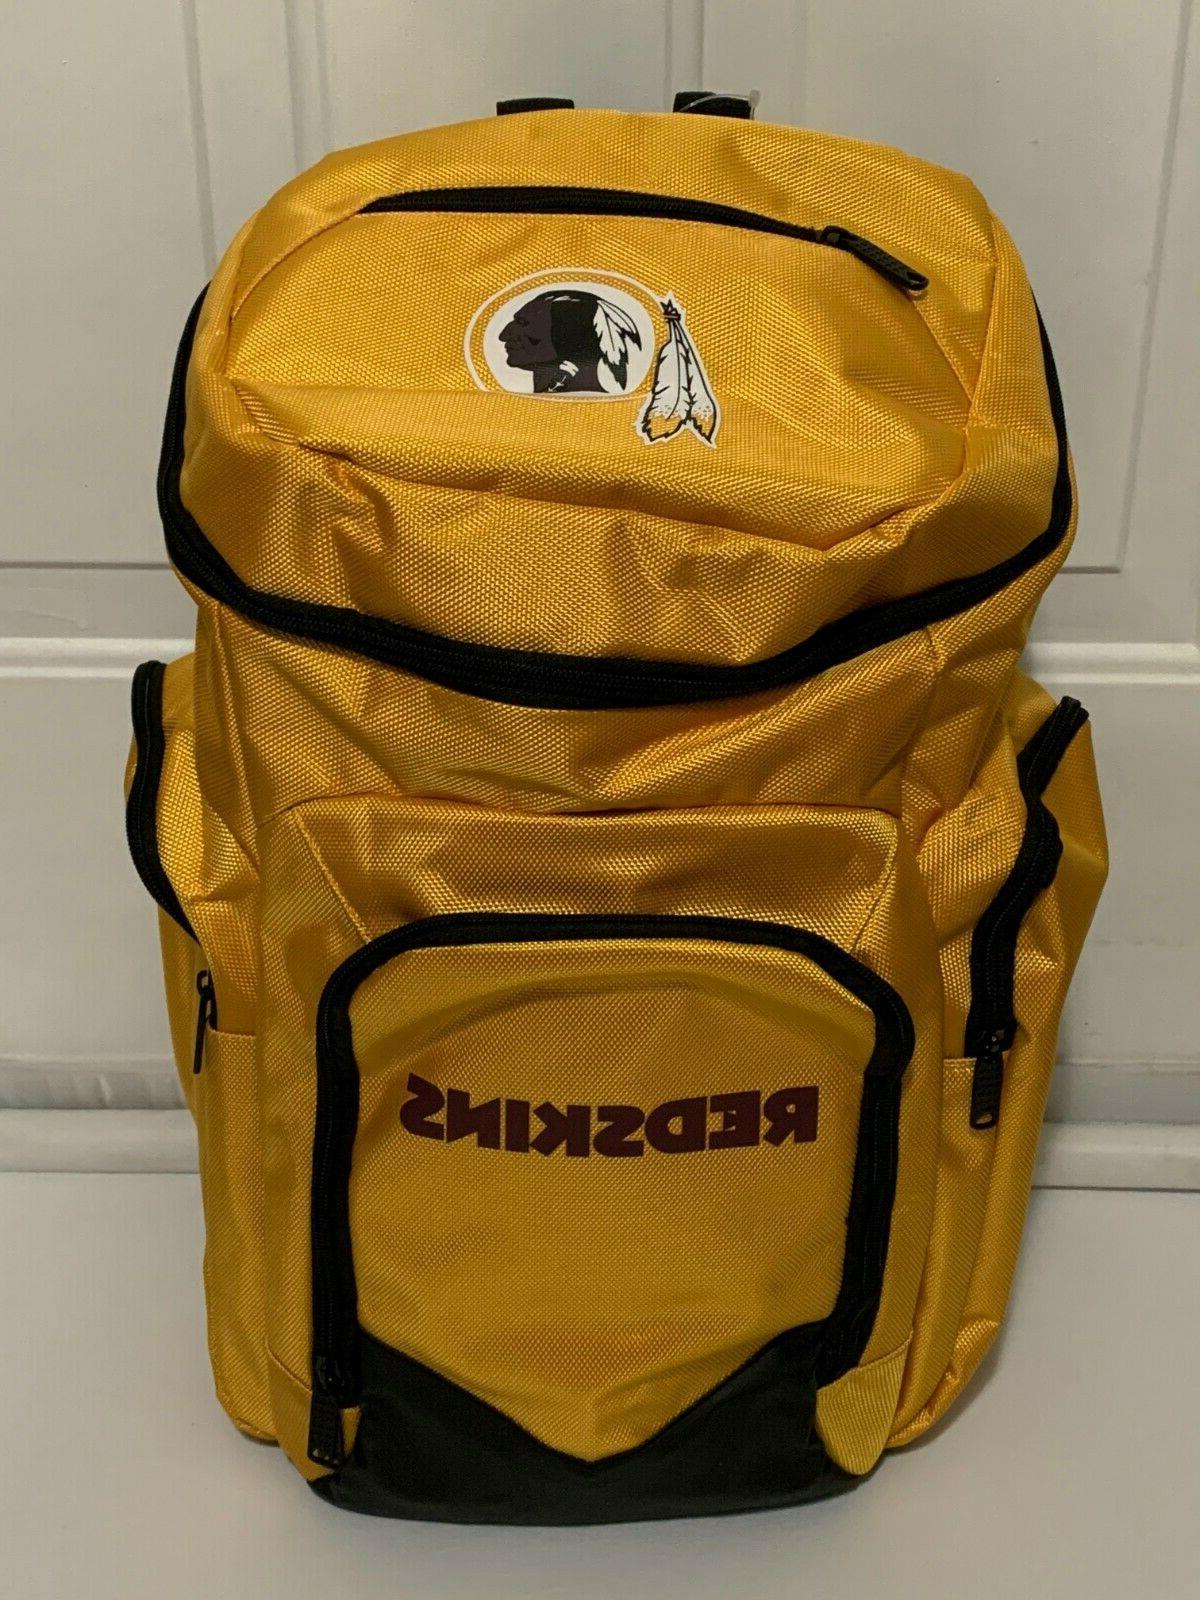 NFL Traveler Washington Redskins Football Pocket Bookbag